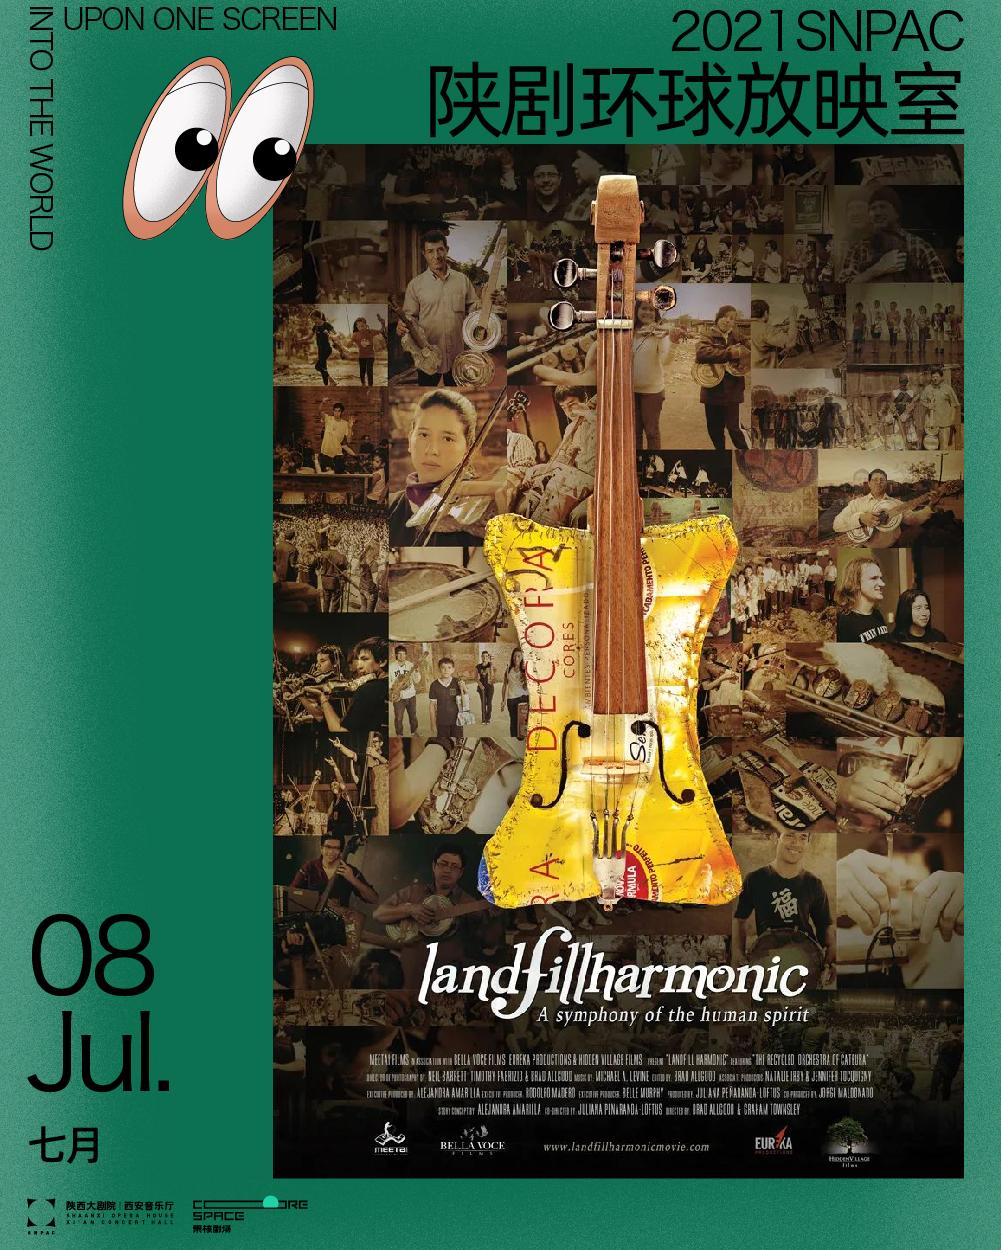 【SNPAC Global Screening】Landfill Harmonic